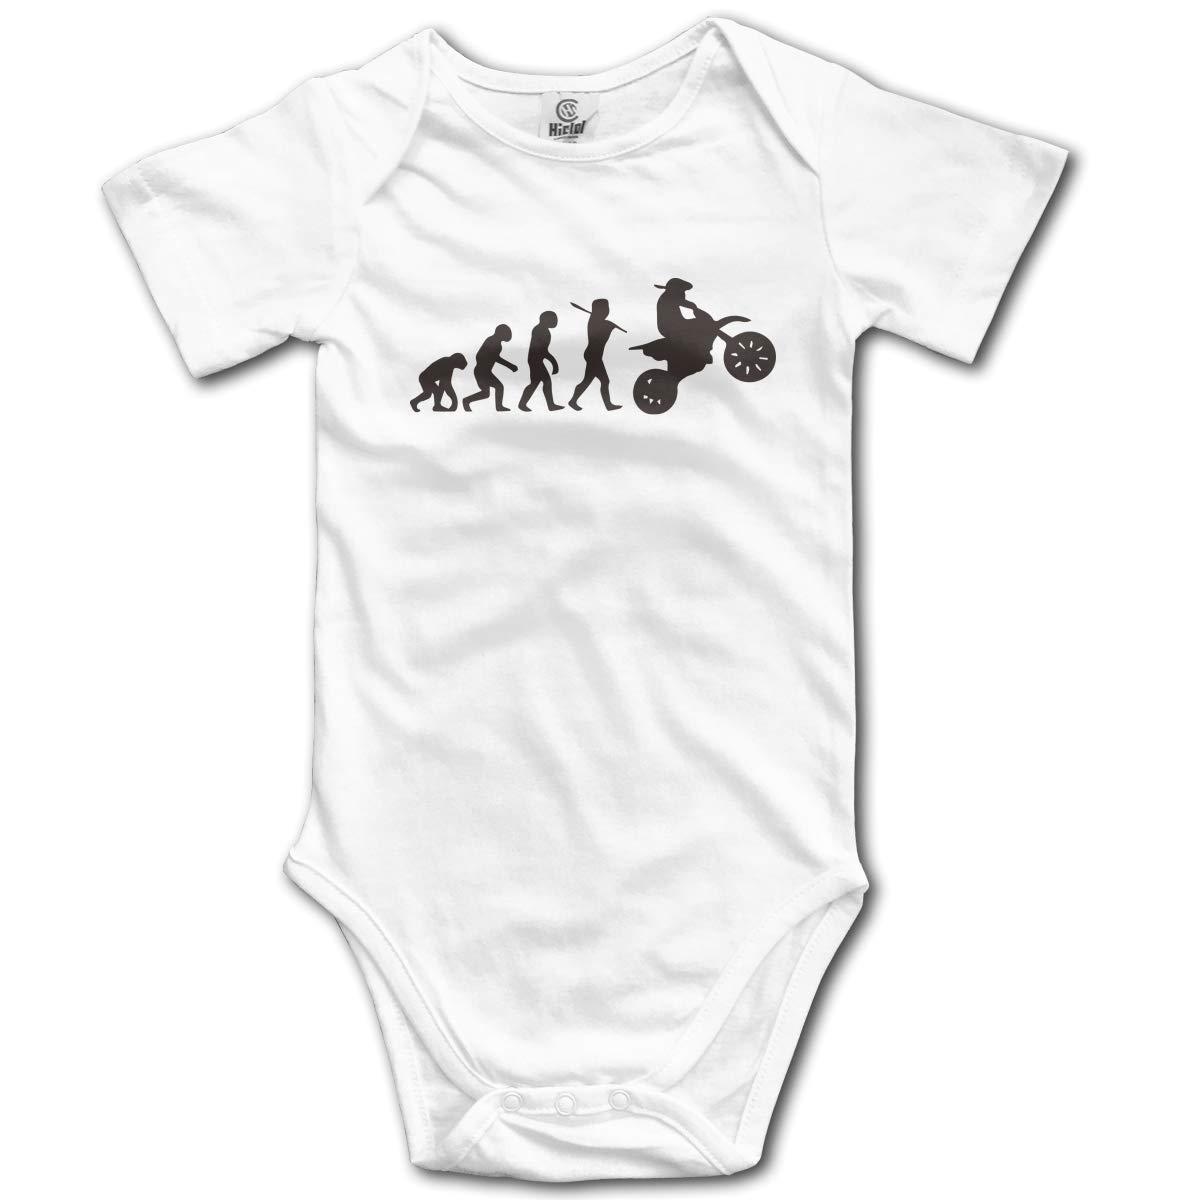 CDHL99 Evolution Motocross-1 Newborn Infant Baby Short Sleeve Rompers Costume Jumpsuit 0-2T